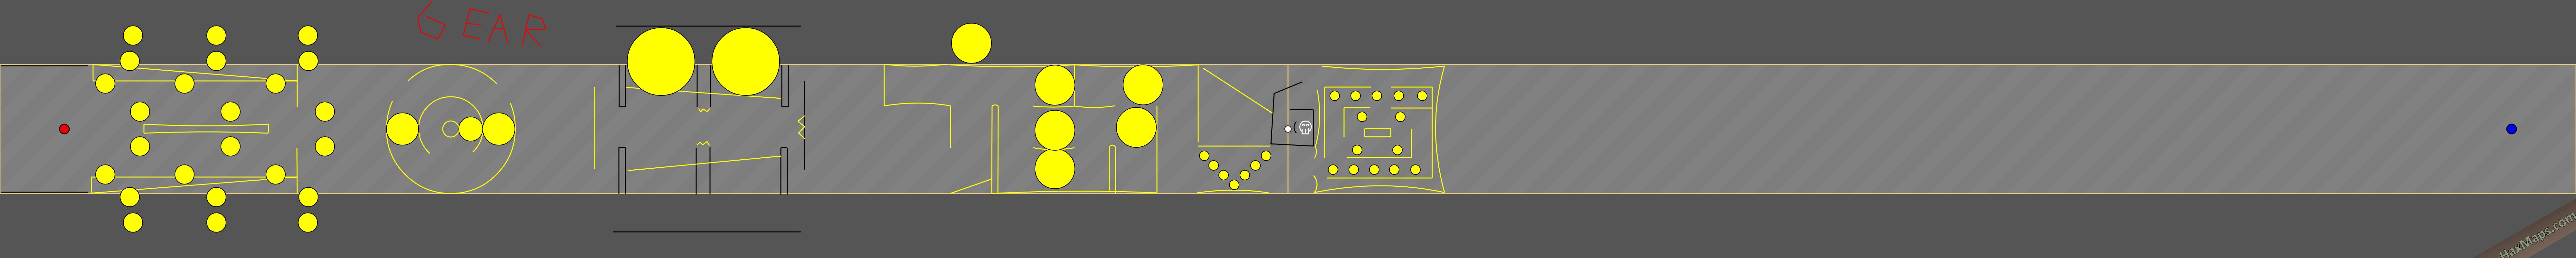 hax ball maps | Gear Yellow Castle